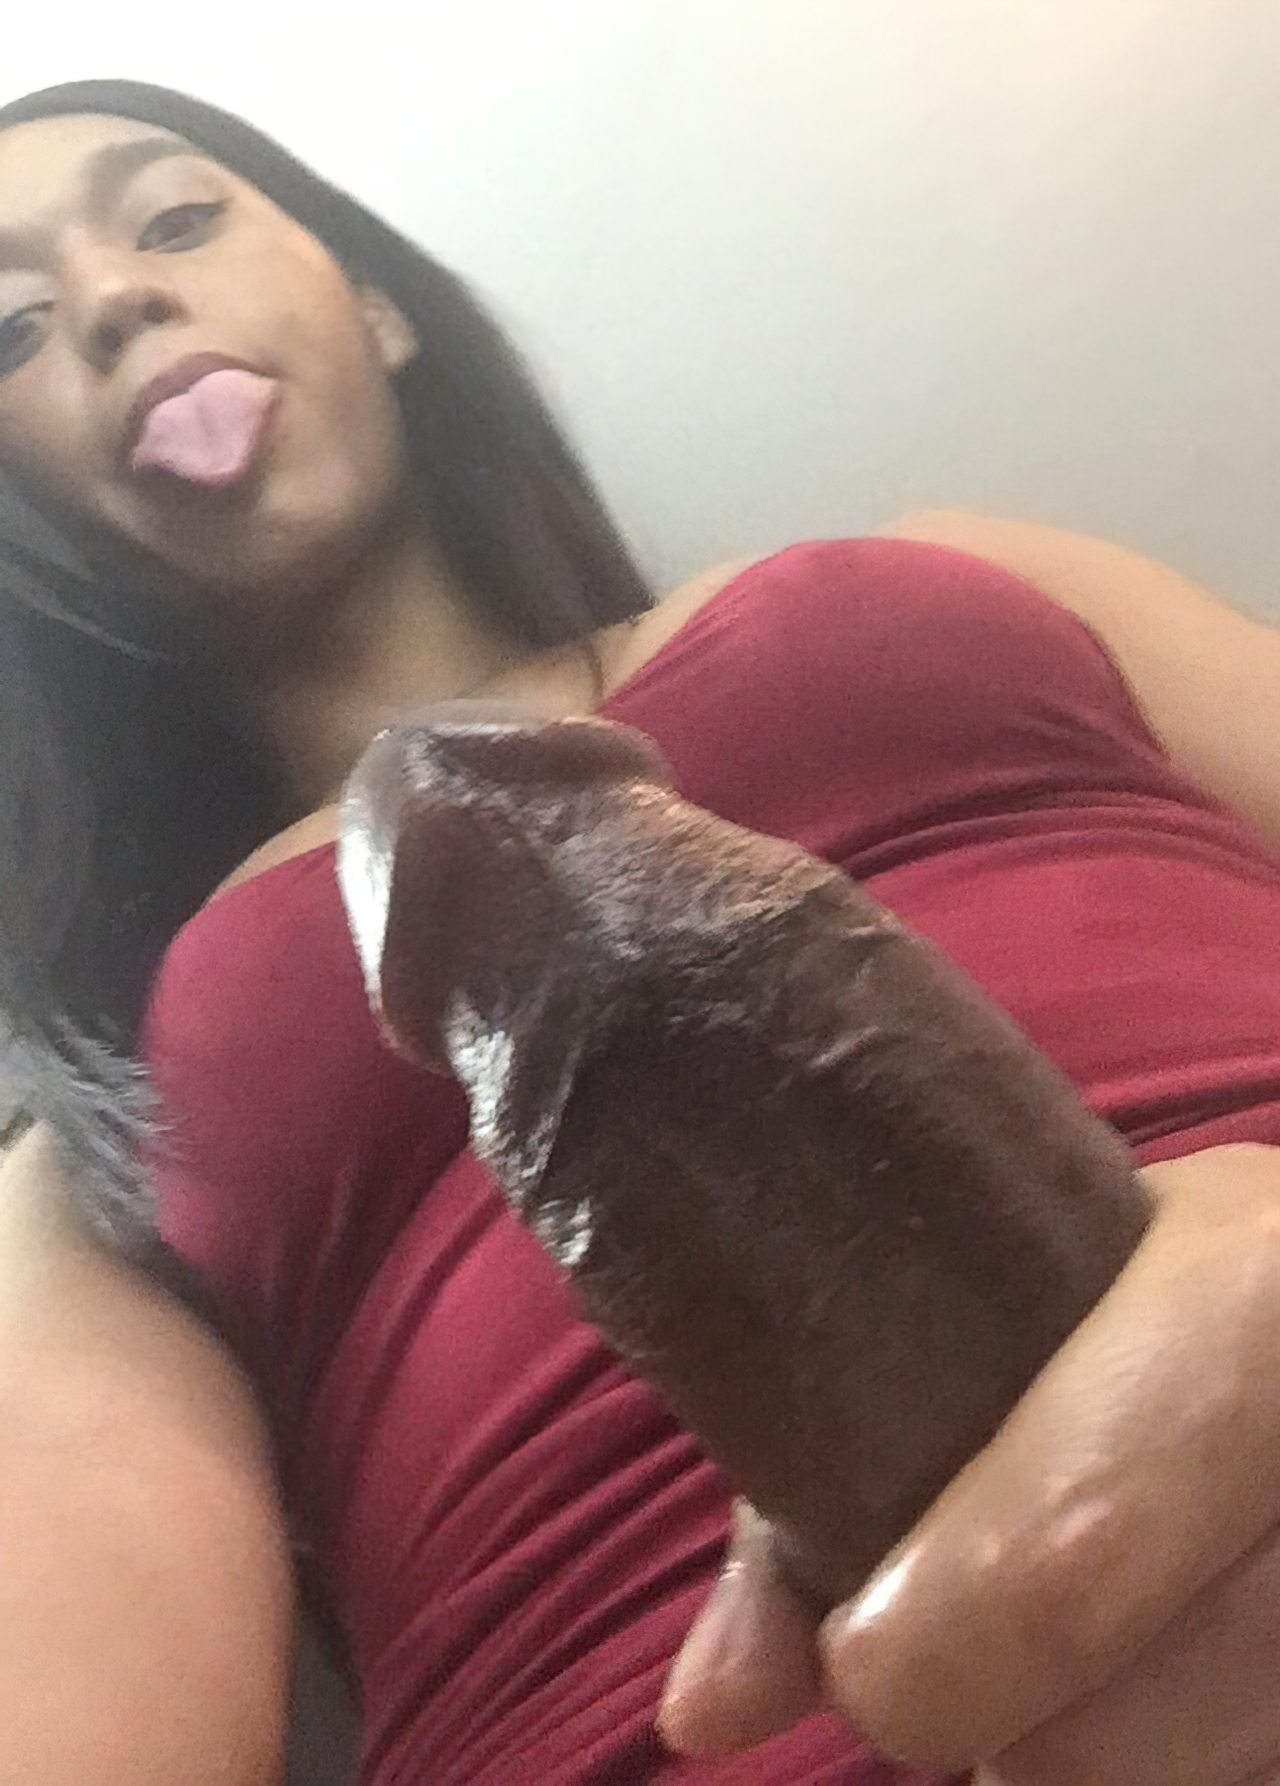 Mostrando o rabinho gostoso da namorada 8